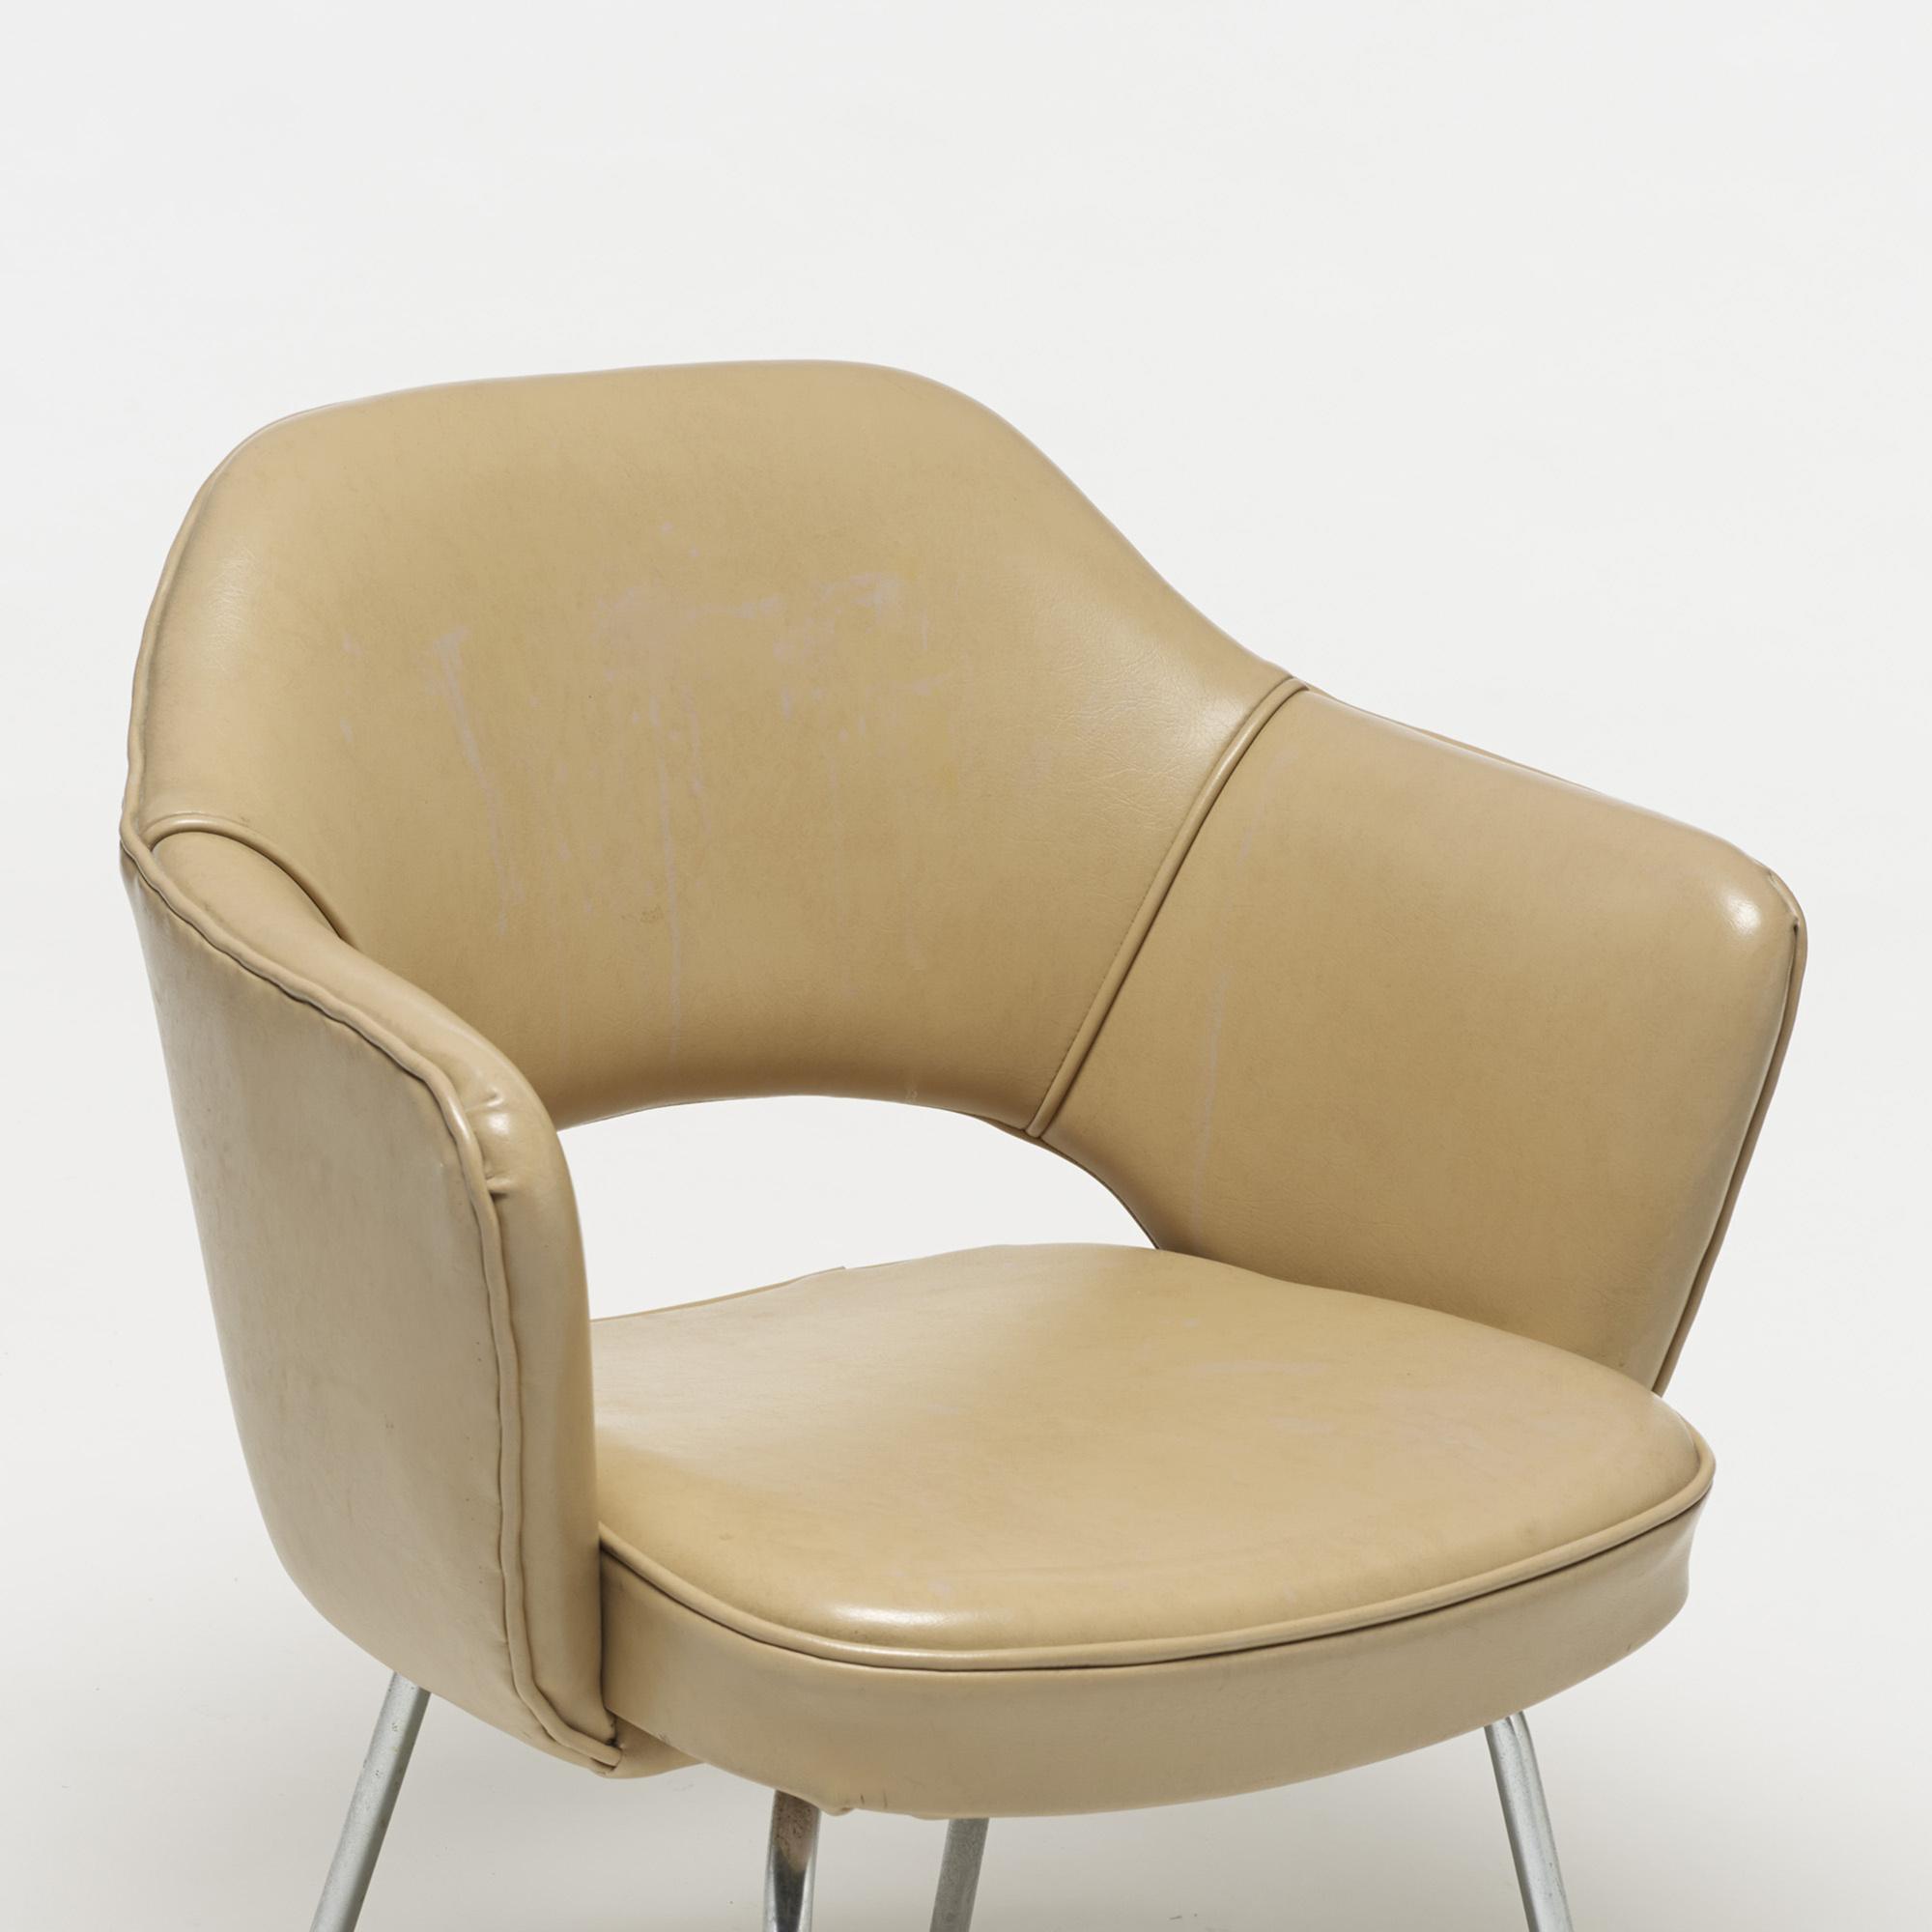 701: Eero Saarinen / Executive armchairs, pair (3 of 4)